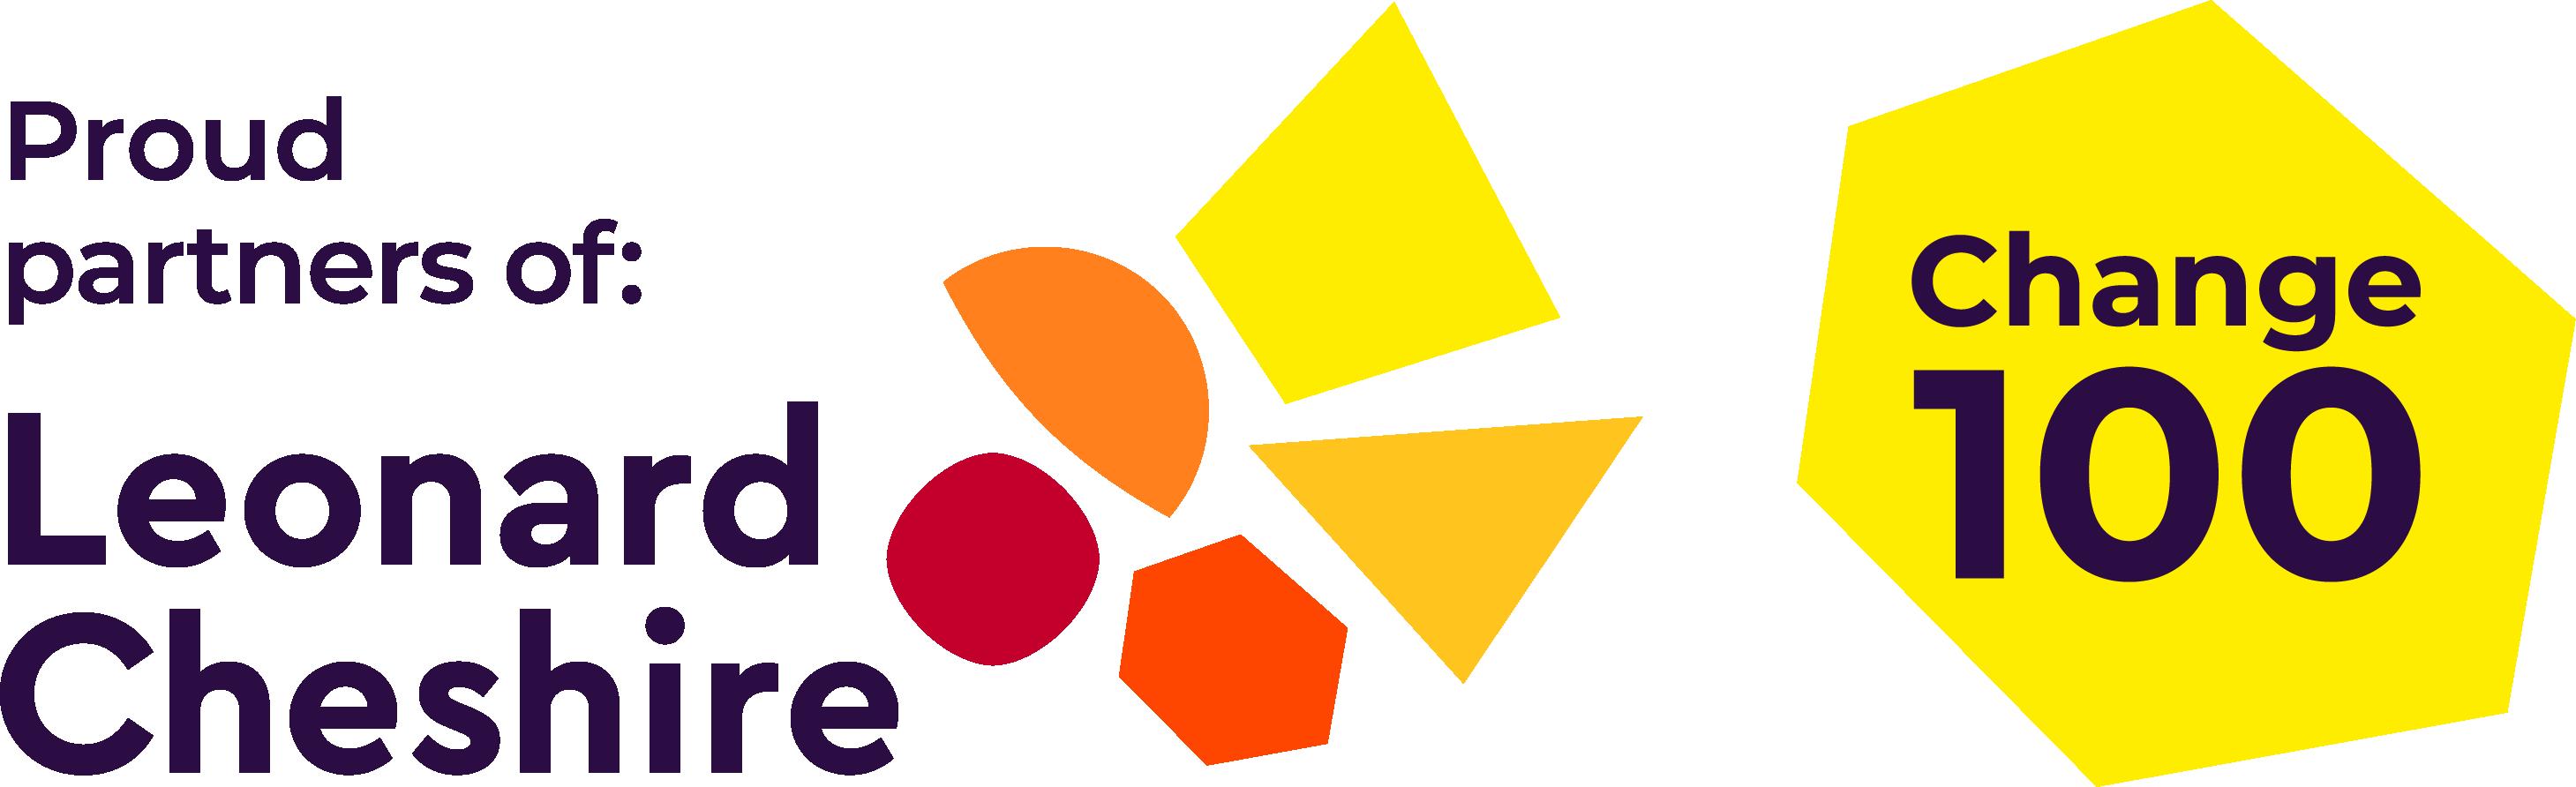 Leonard Cheshire Change 100 logo